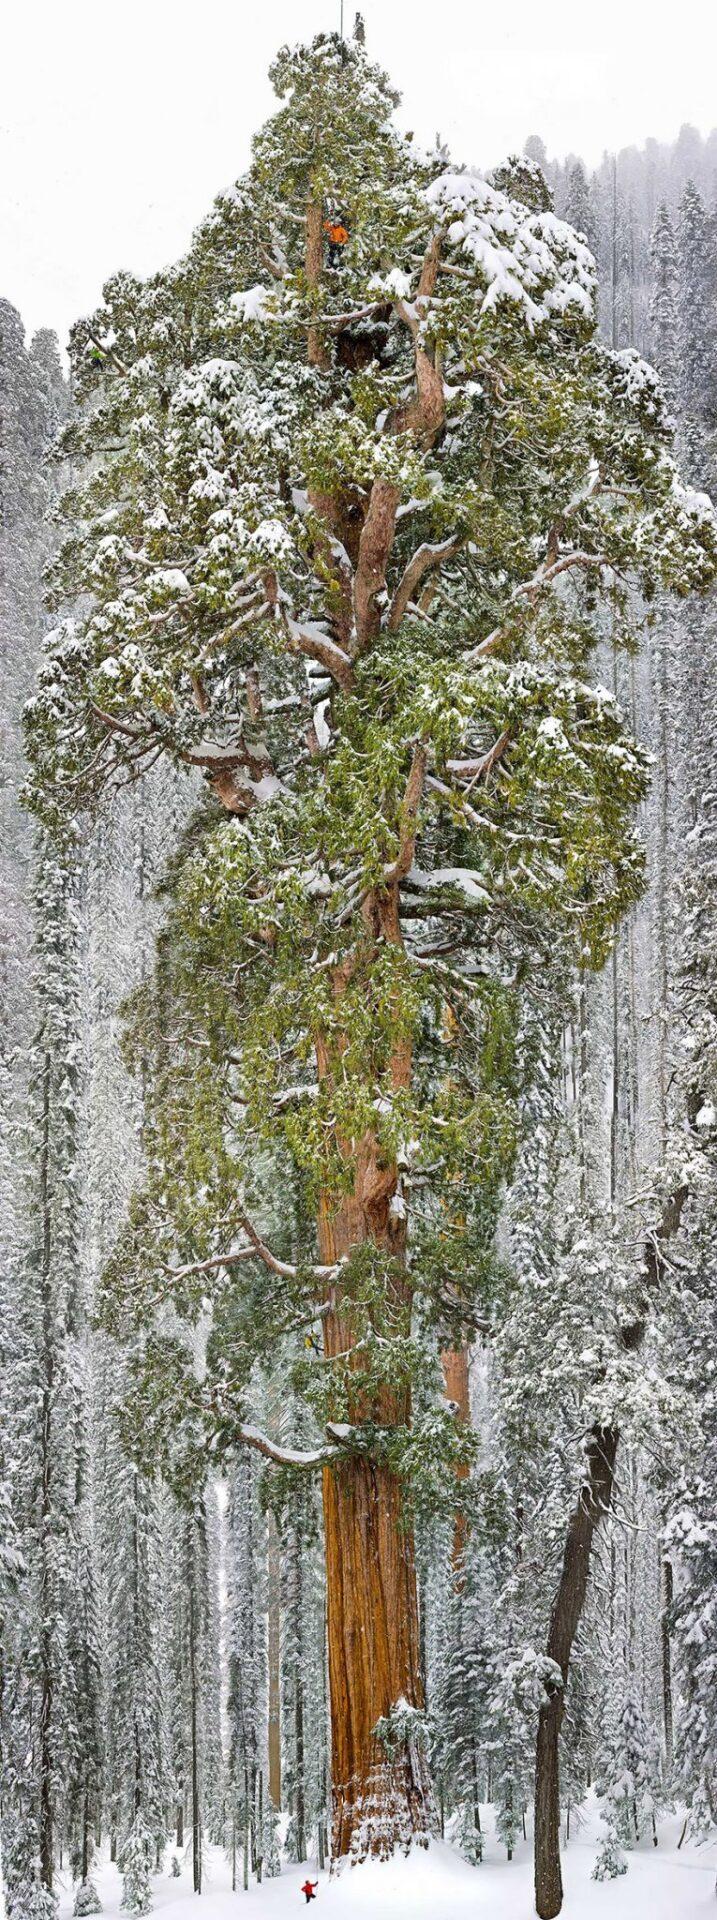 11 lugares que te fazem se sentir insignificante 2 sequoia park california